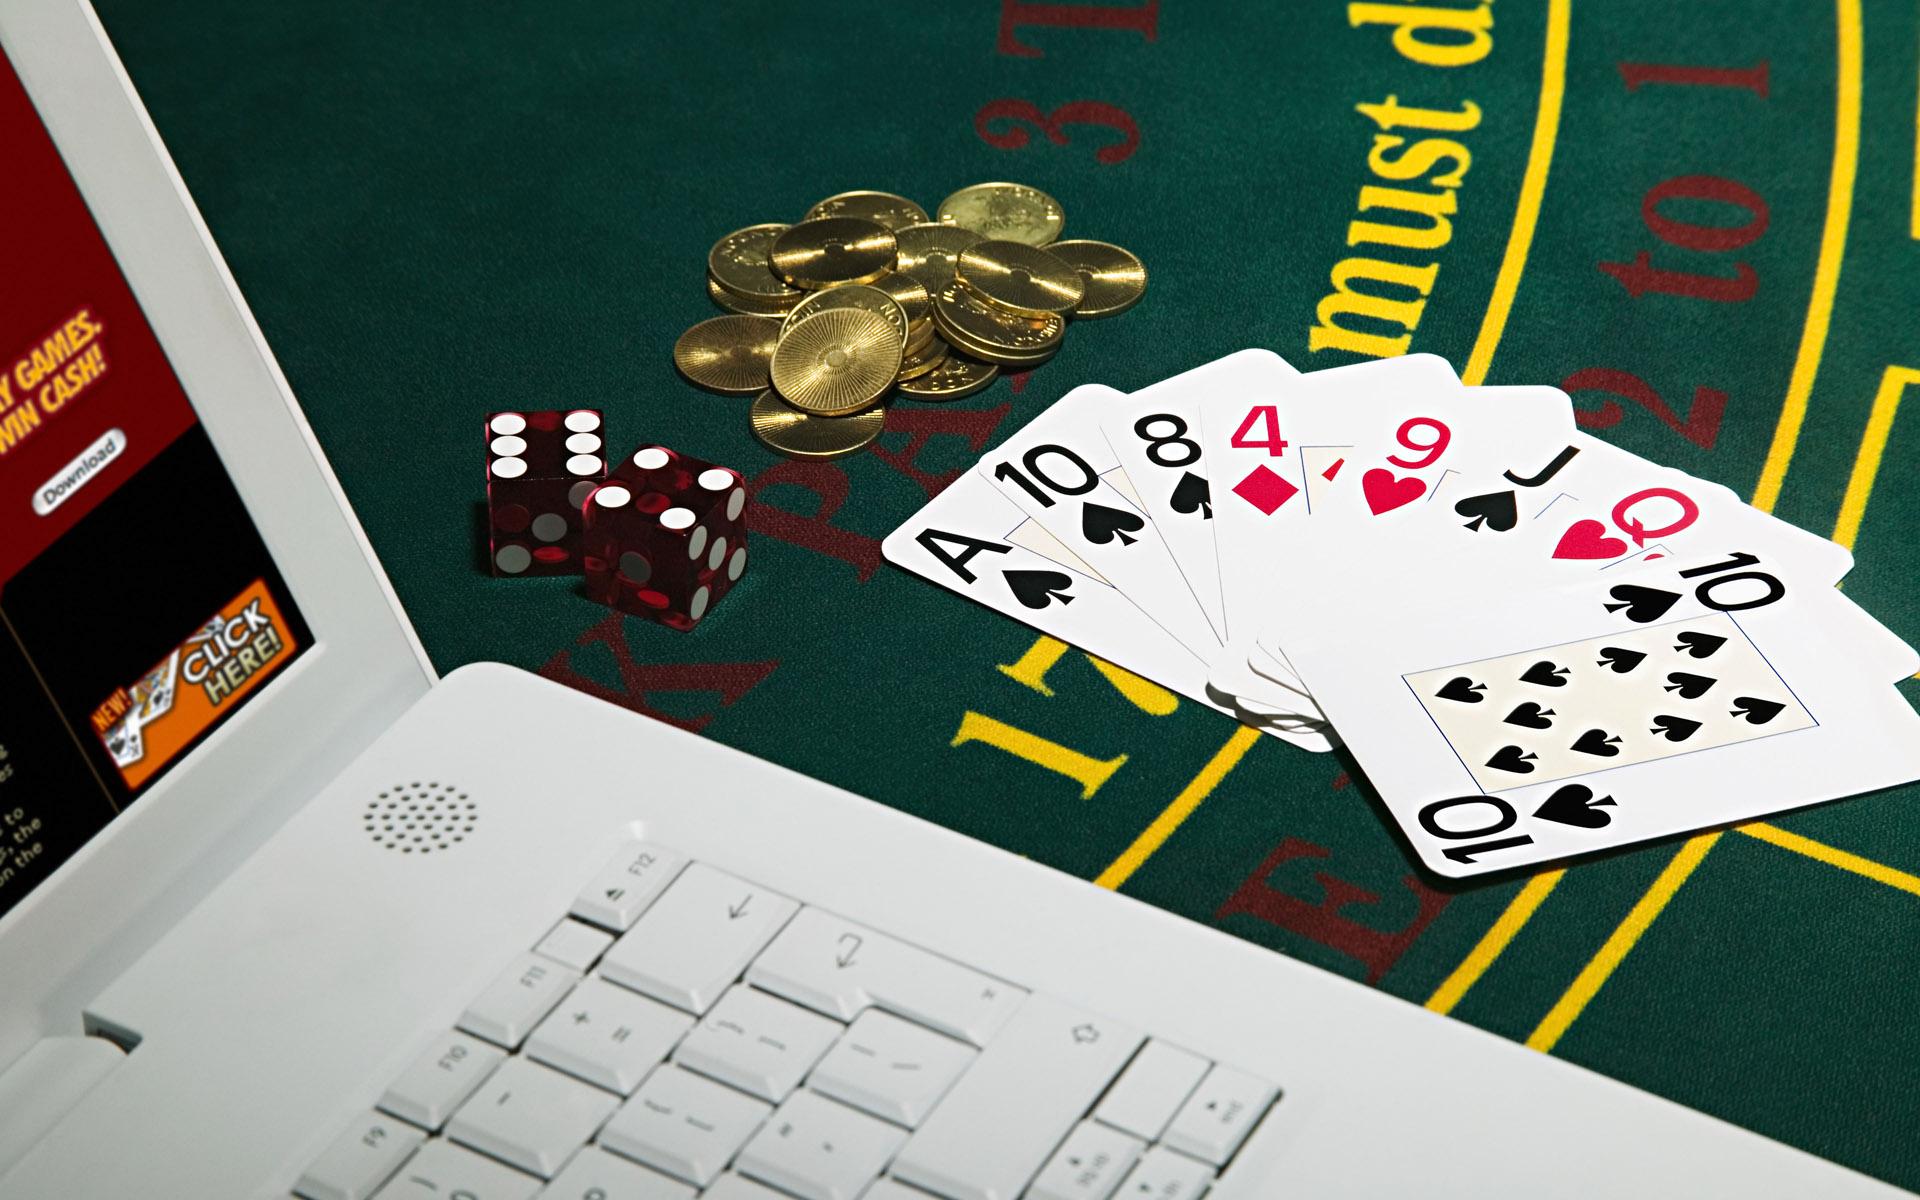 Құмар казино рулетка